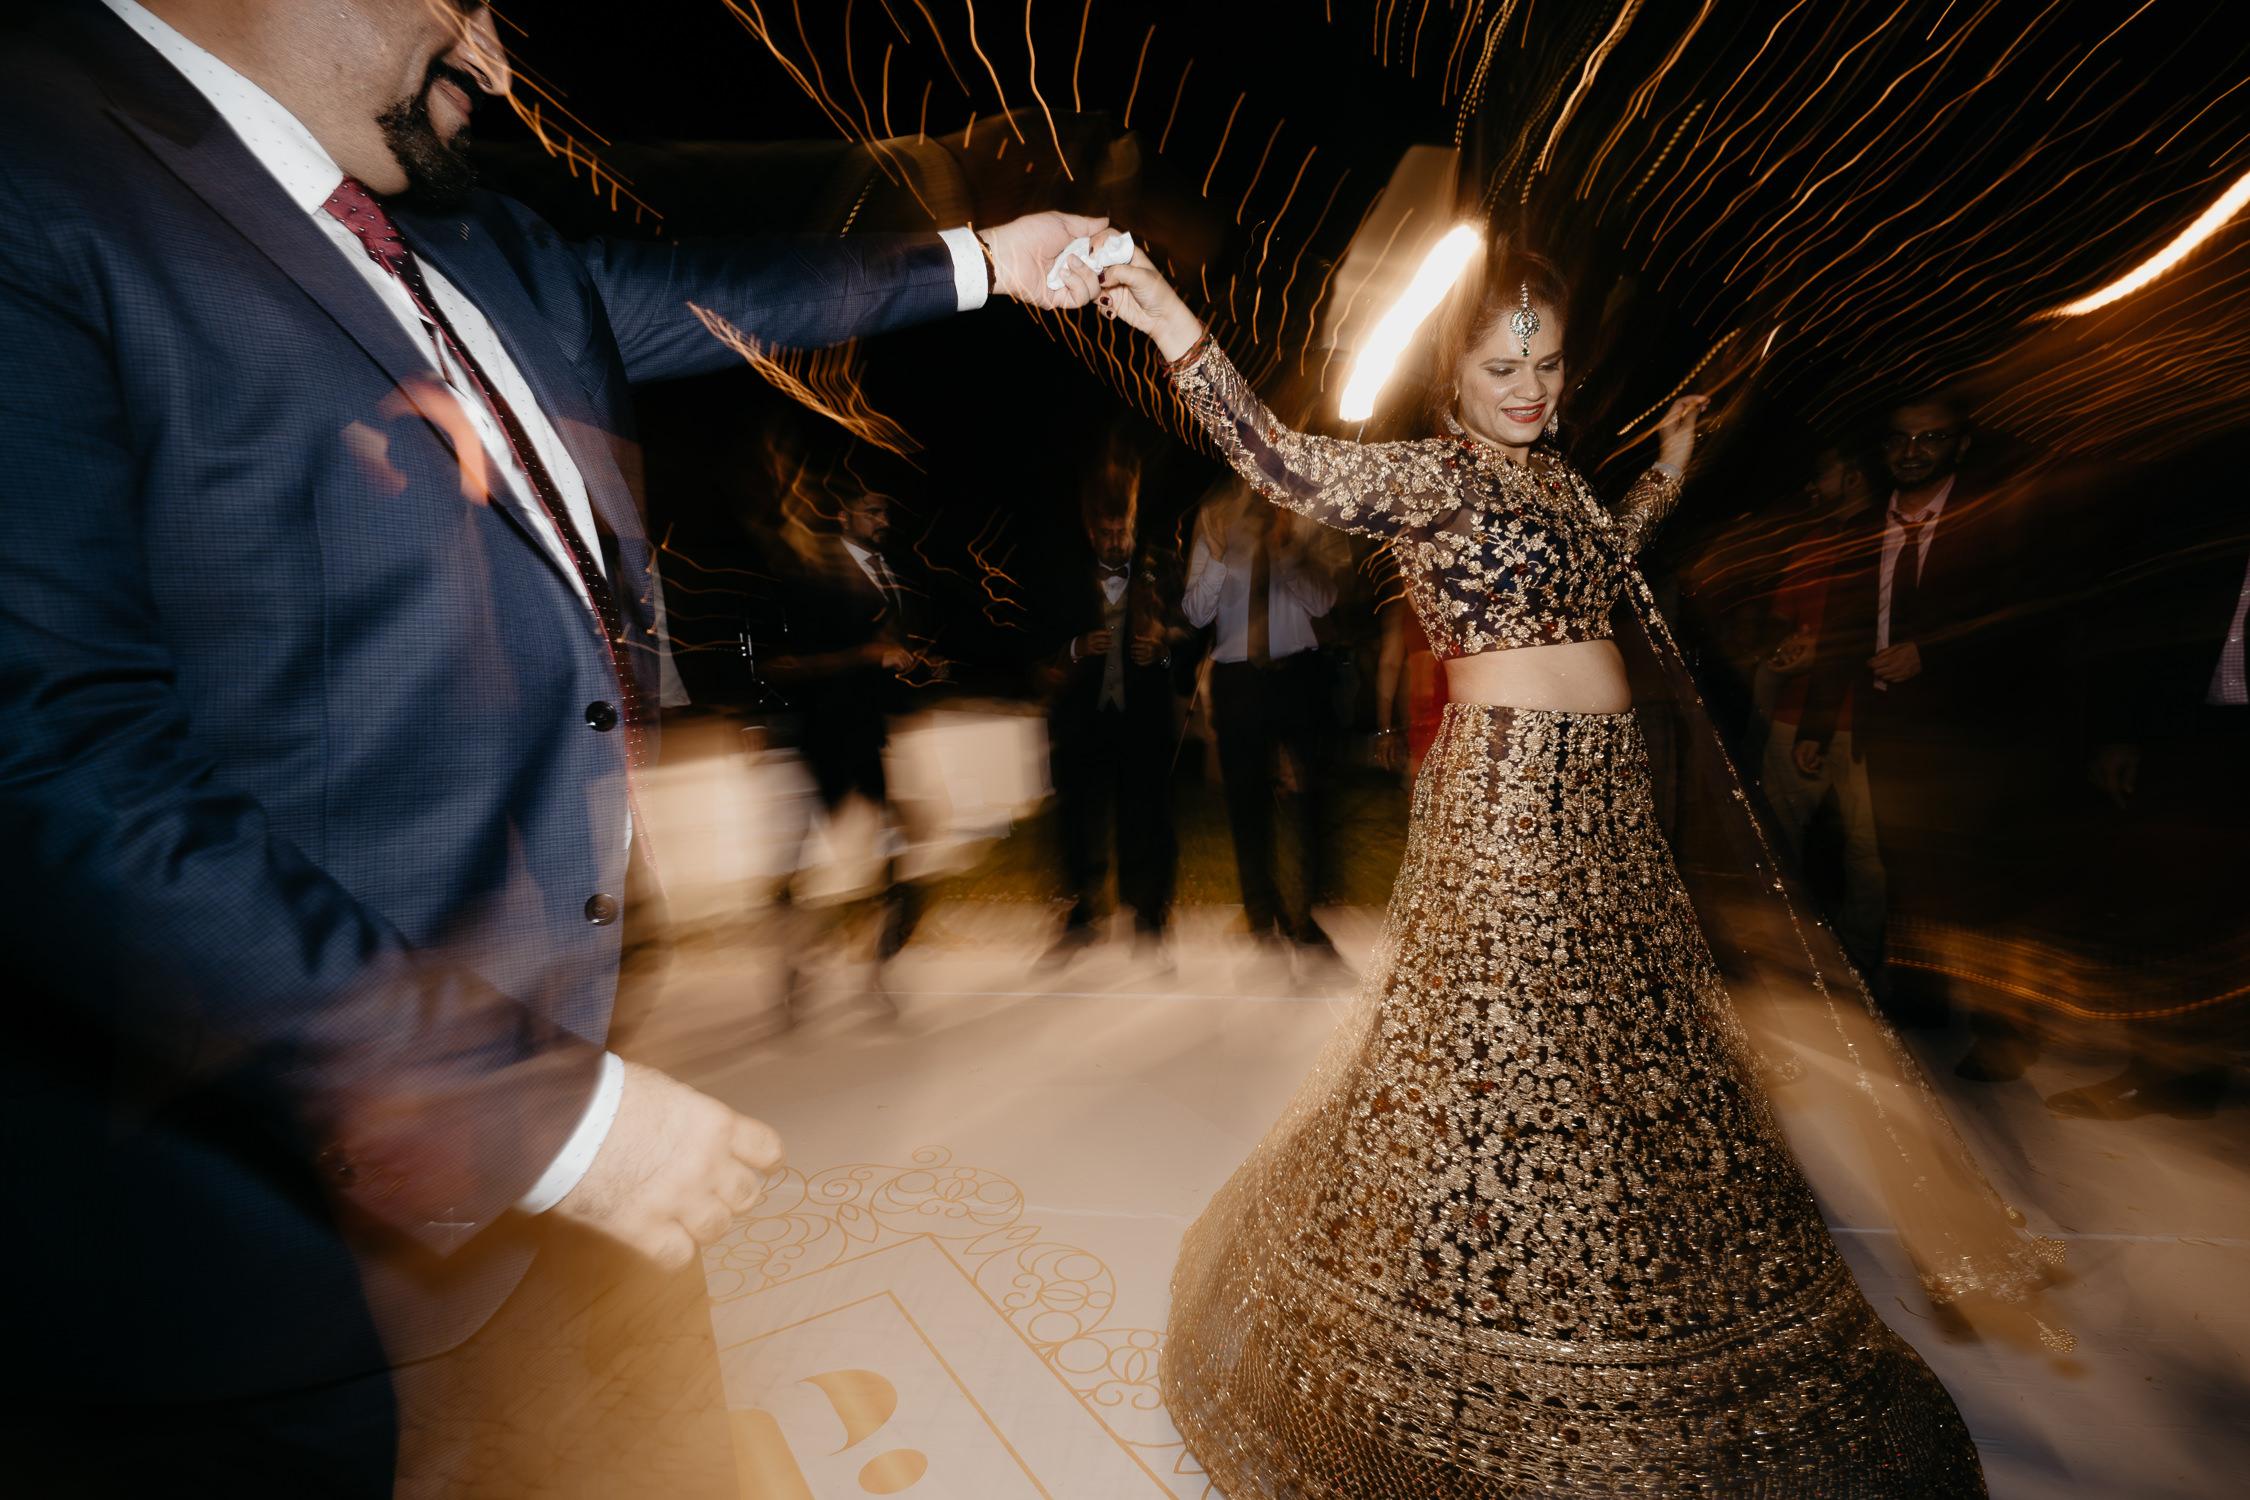 destination-wedding-photographer-amsterdam-Aqil Benazir-488.jpg